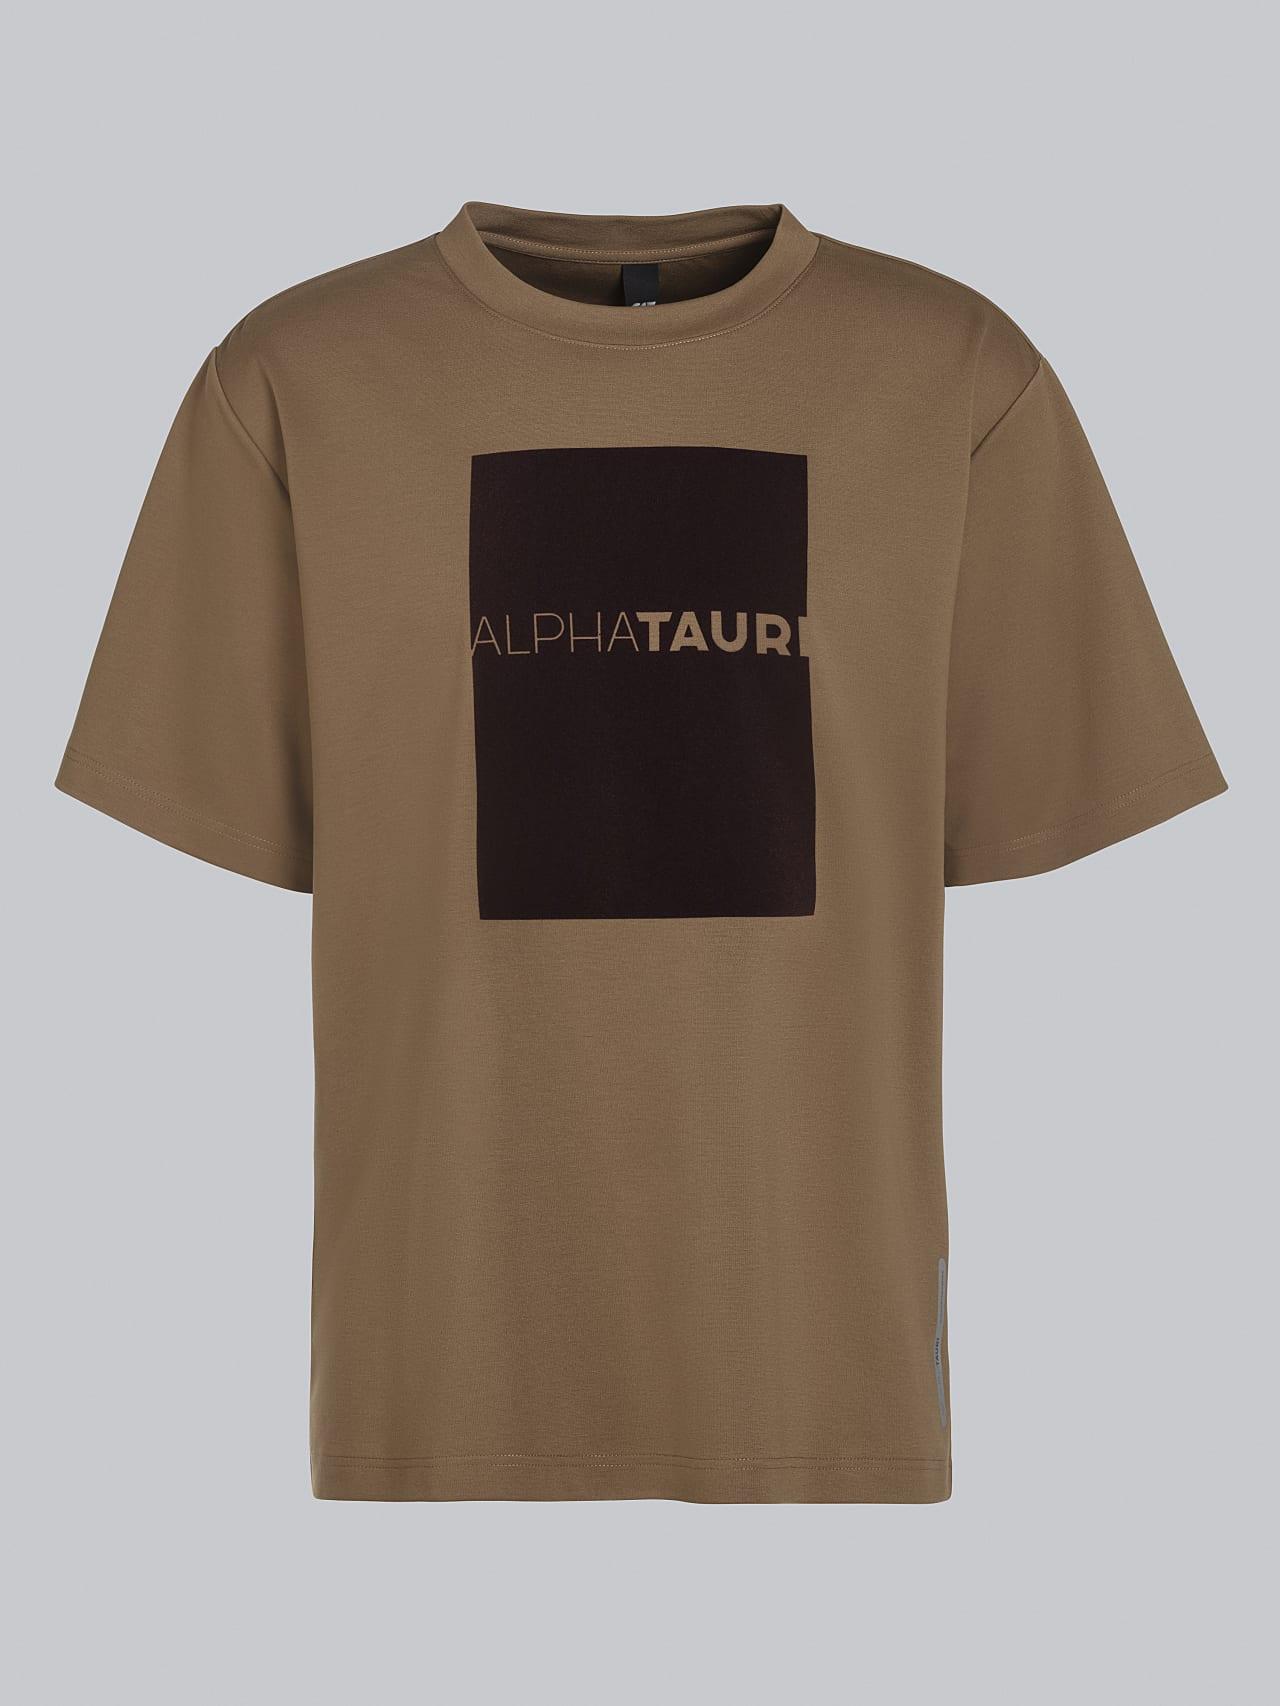 JAHEV V1.Y5.02 Relaxed Logo T-Shirt gold Back Alpha Tauri